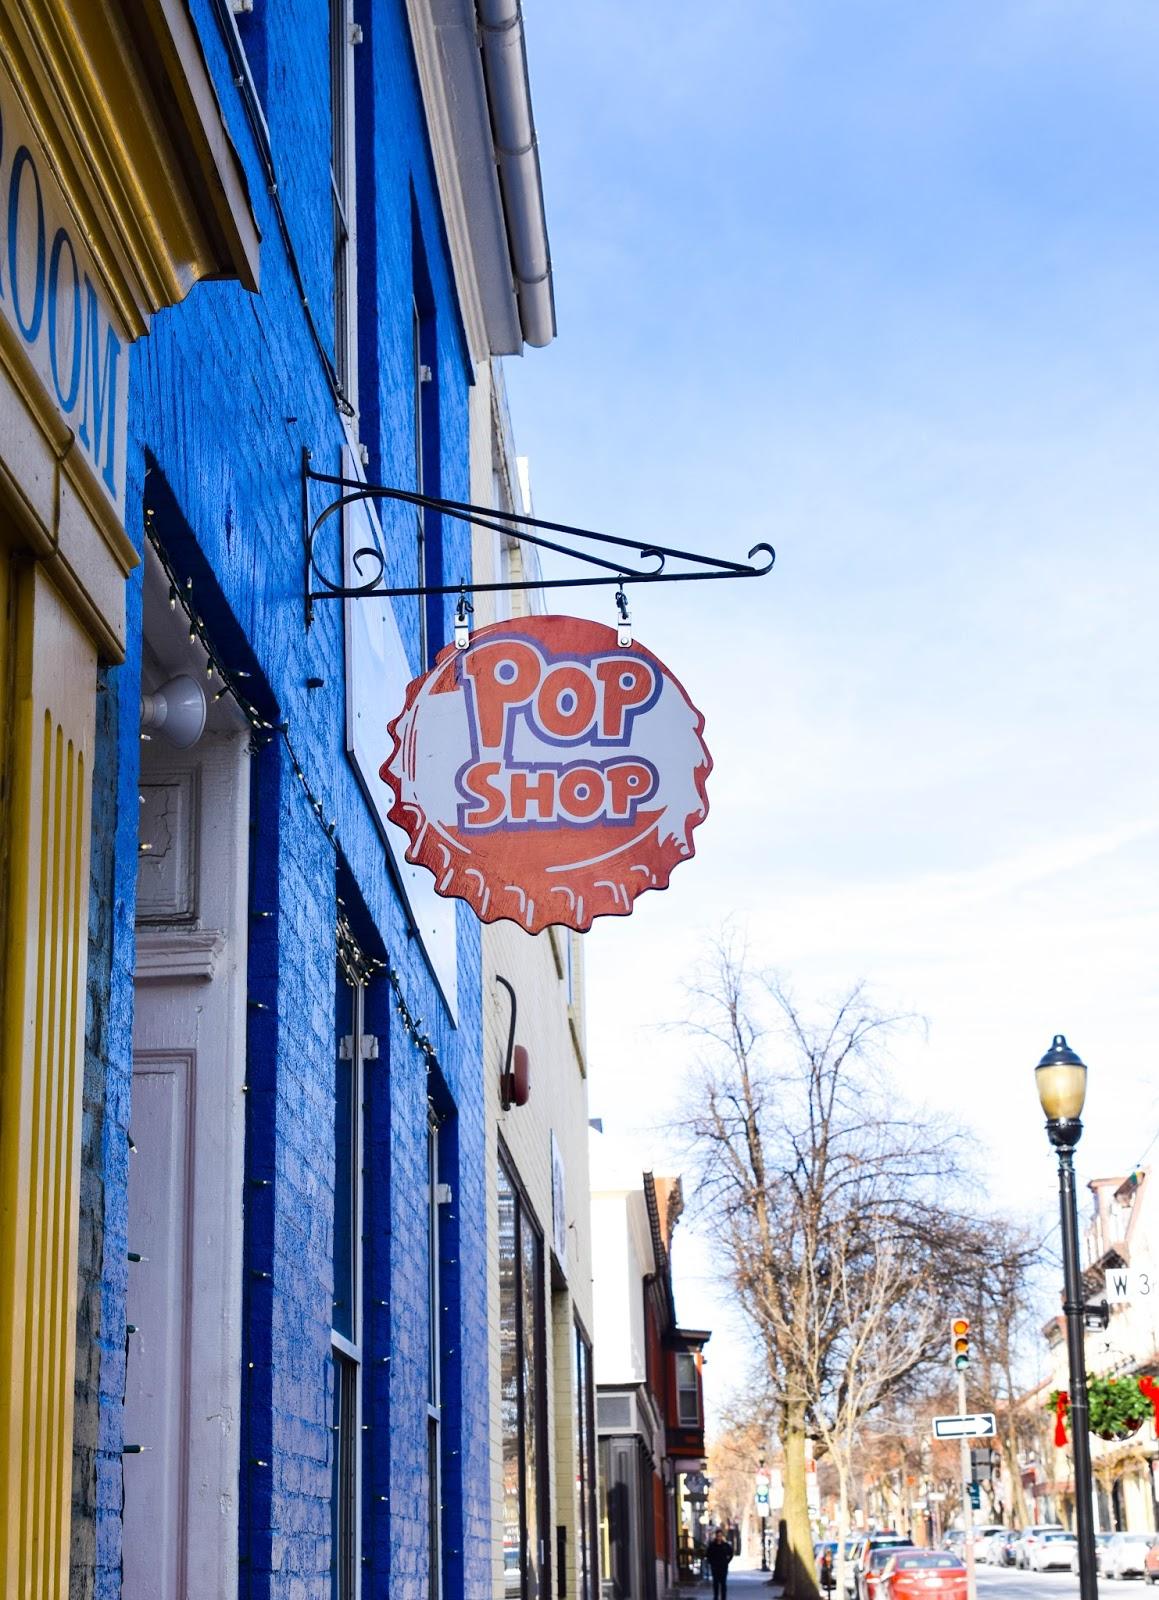 frederick maryland travel guide pop shop - visit frederick - downtown historic frederick